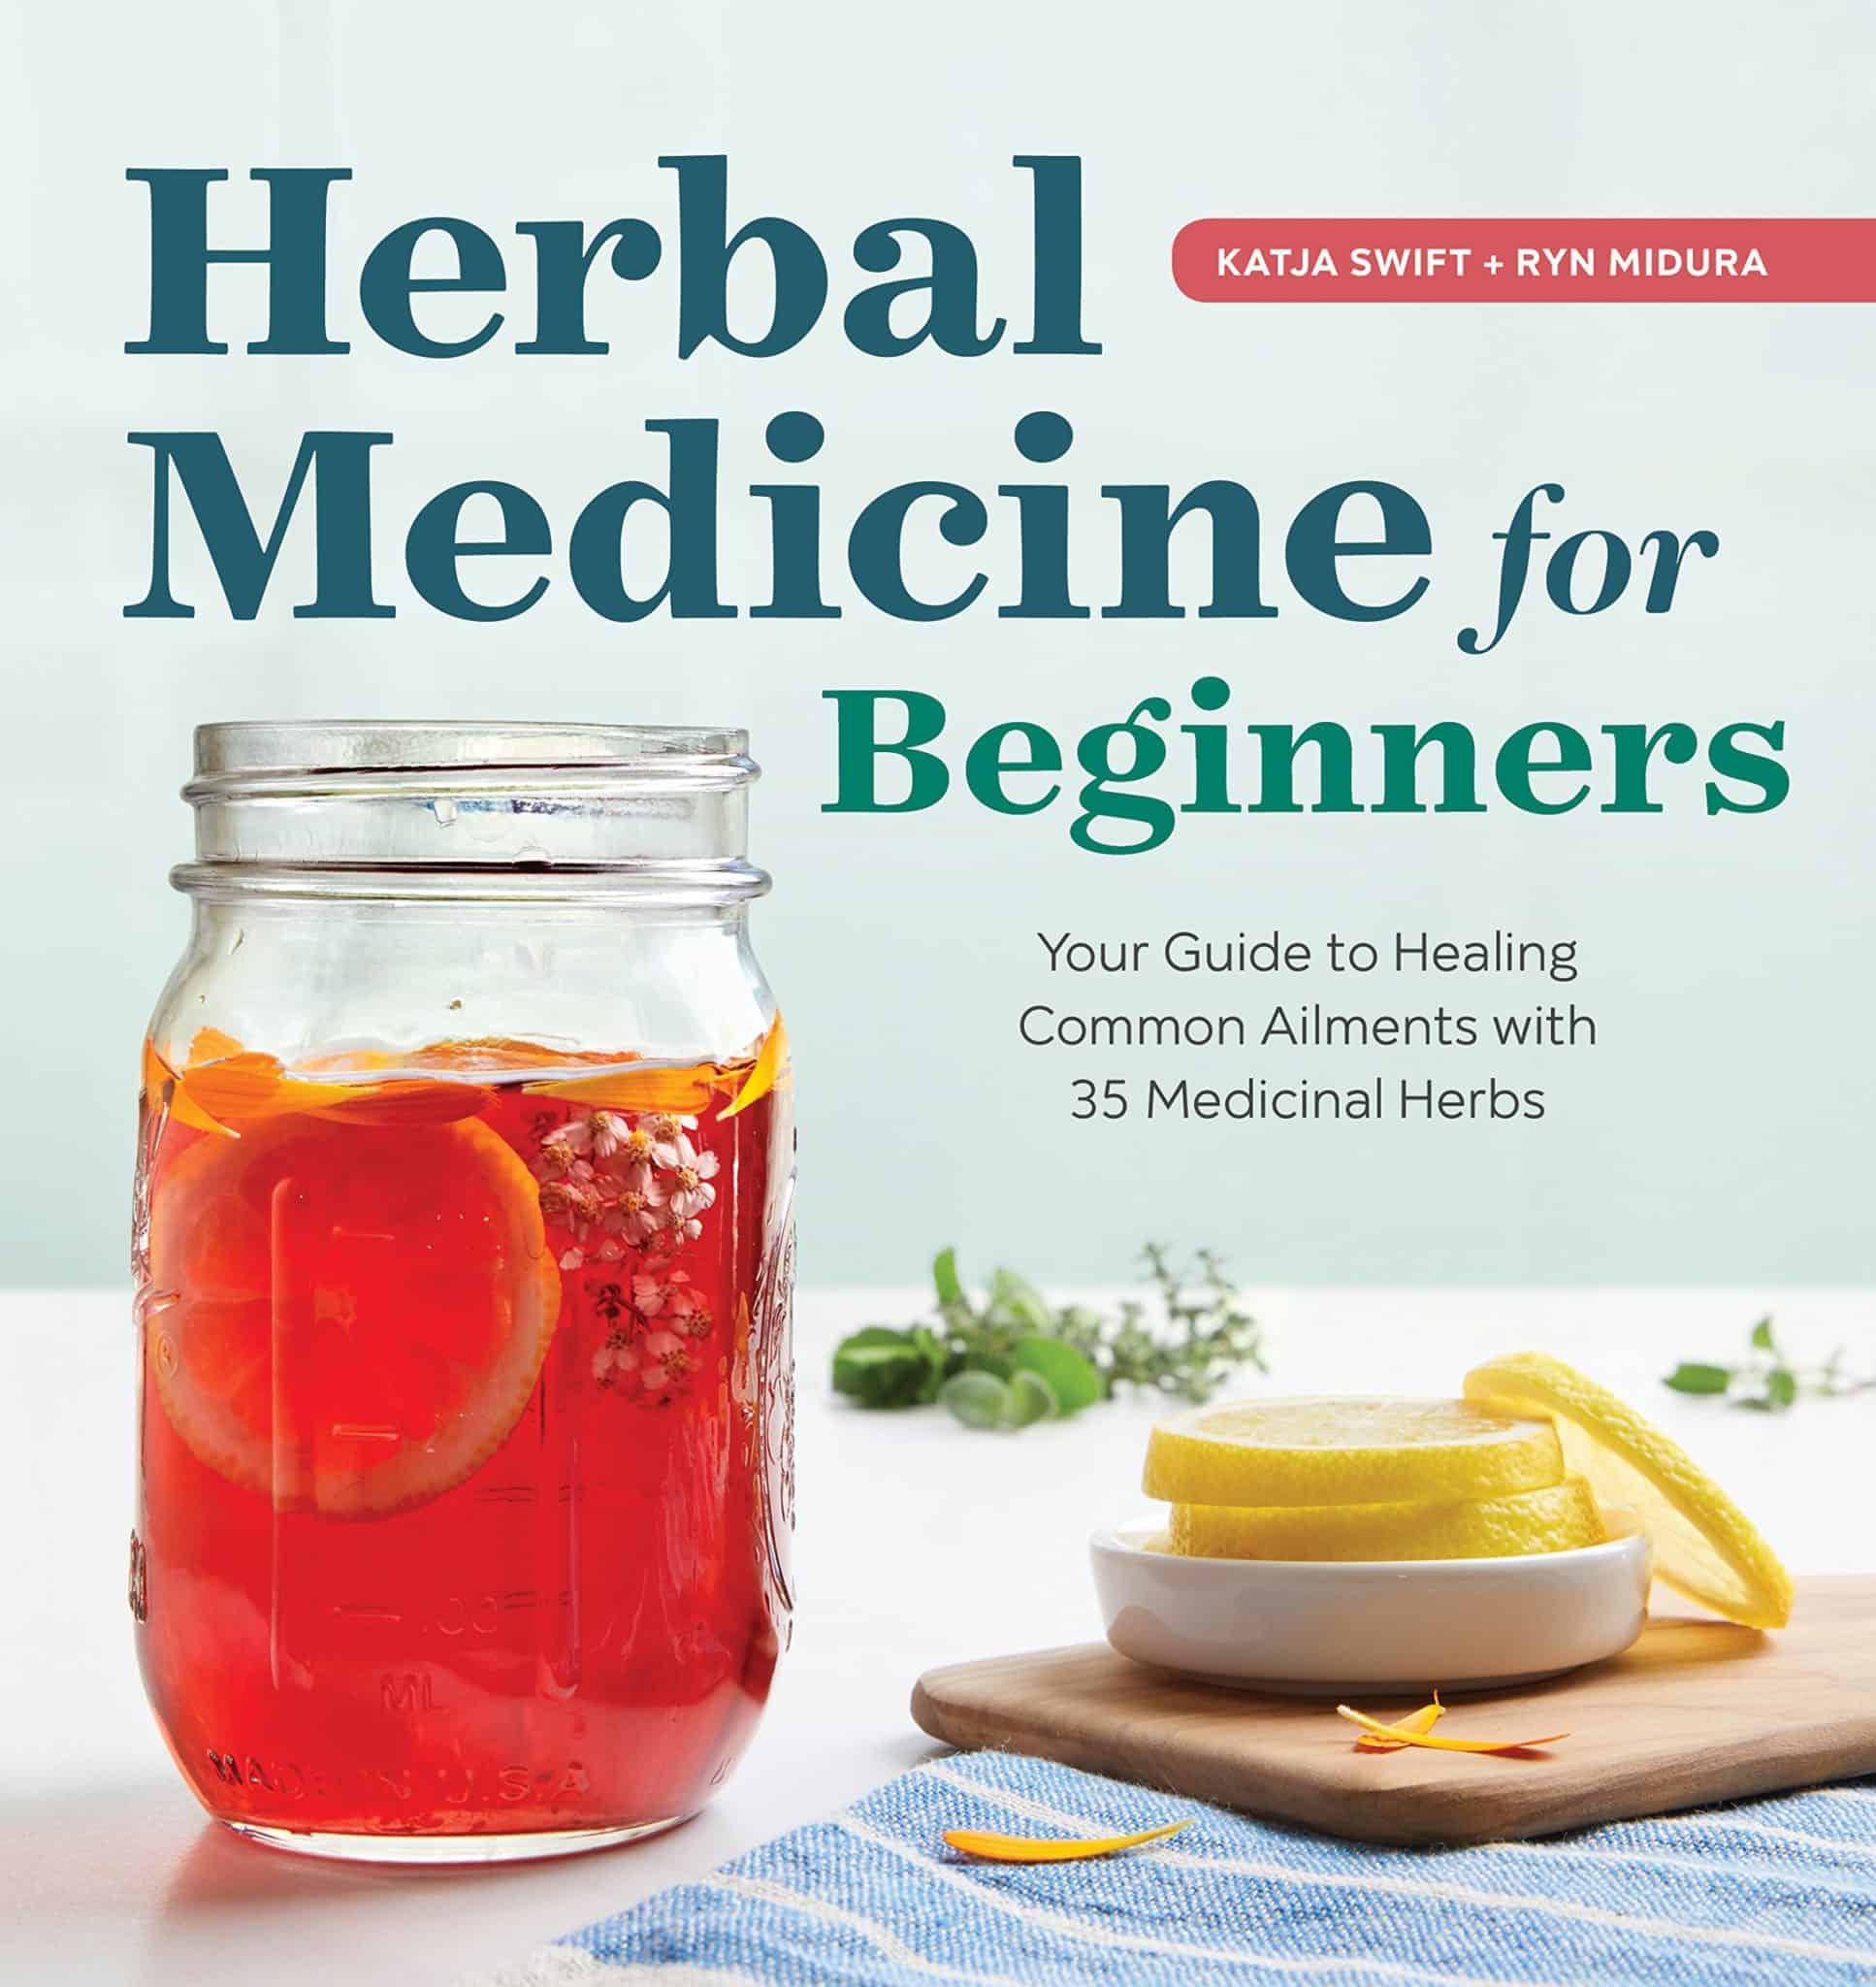 Herbal Medicine for Beginners by Katja Swift & Ryn Midura